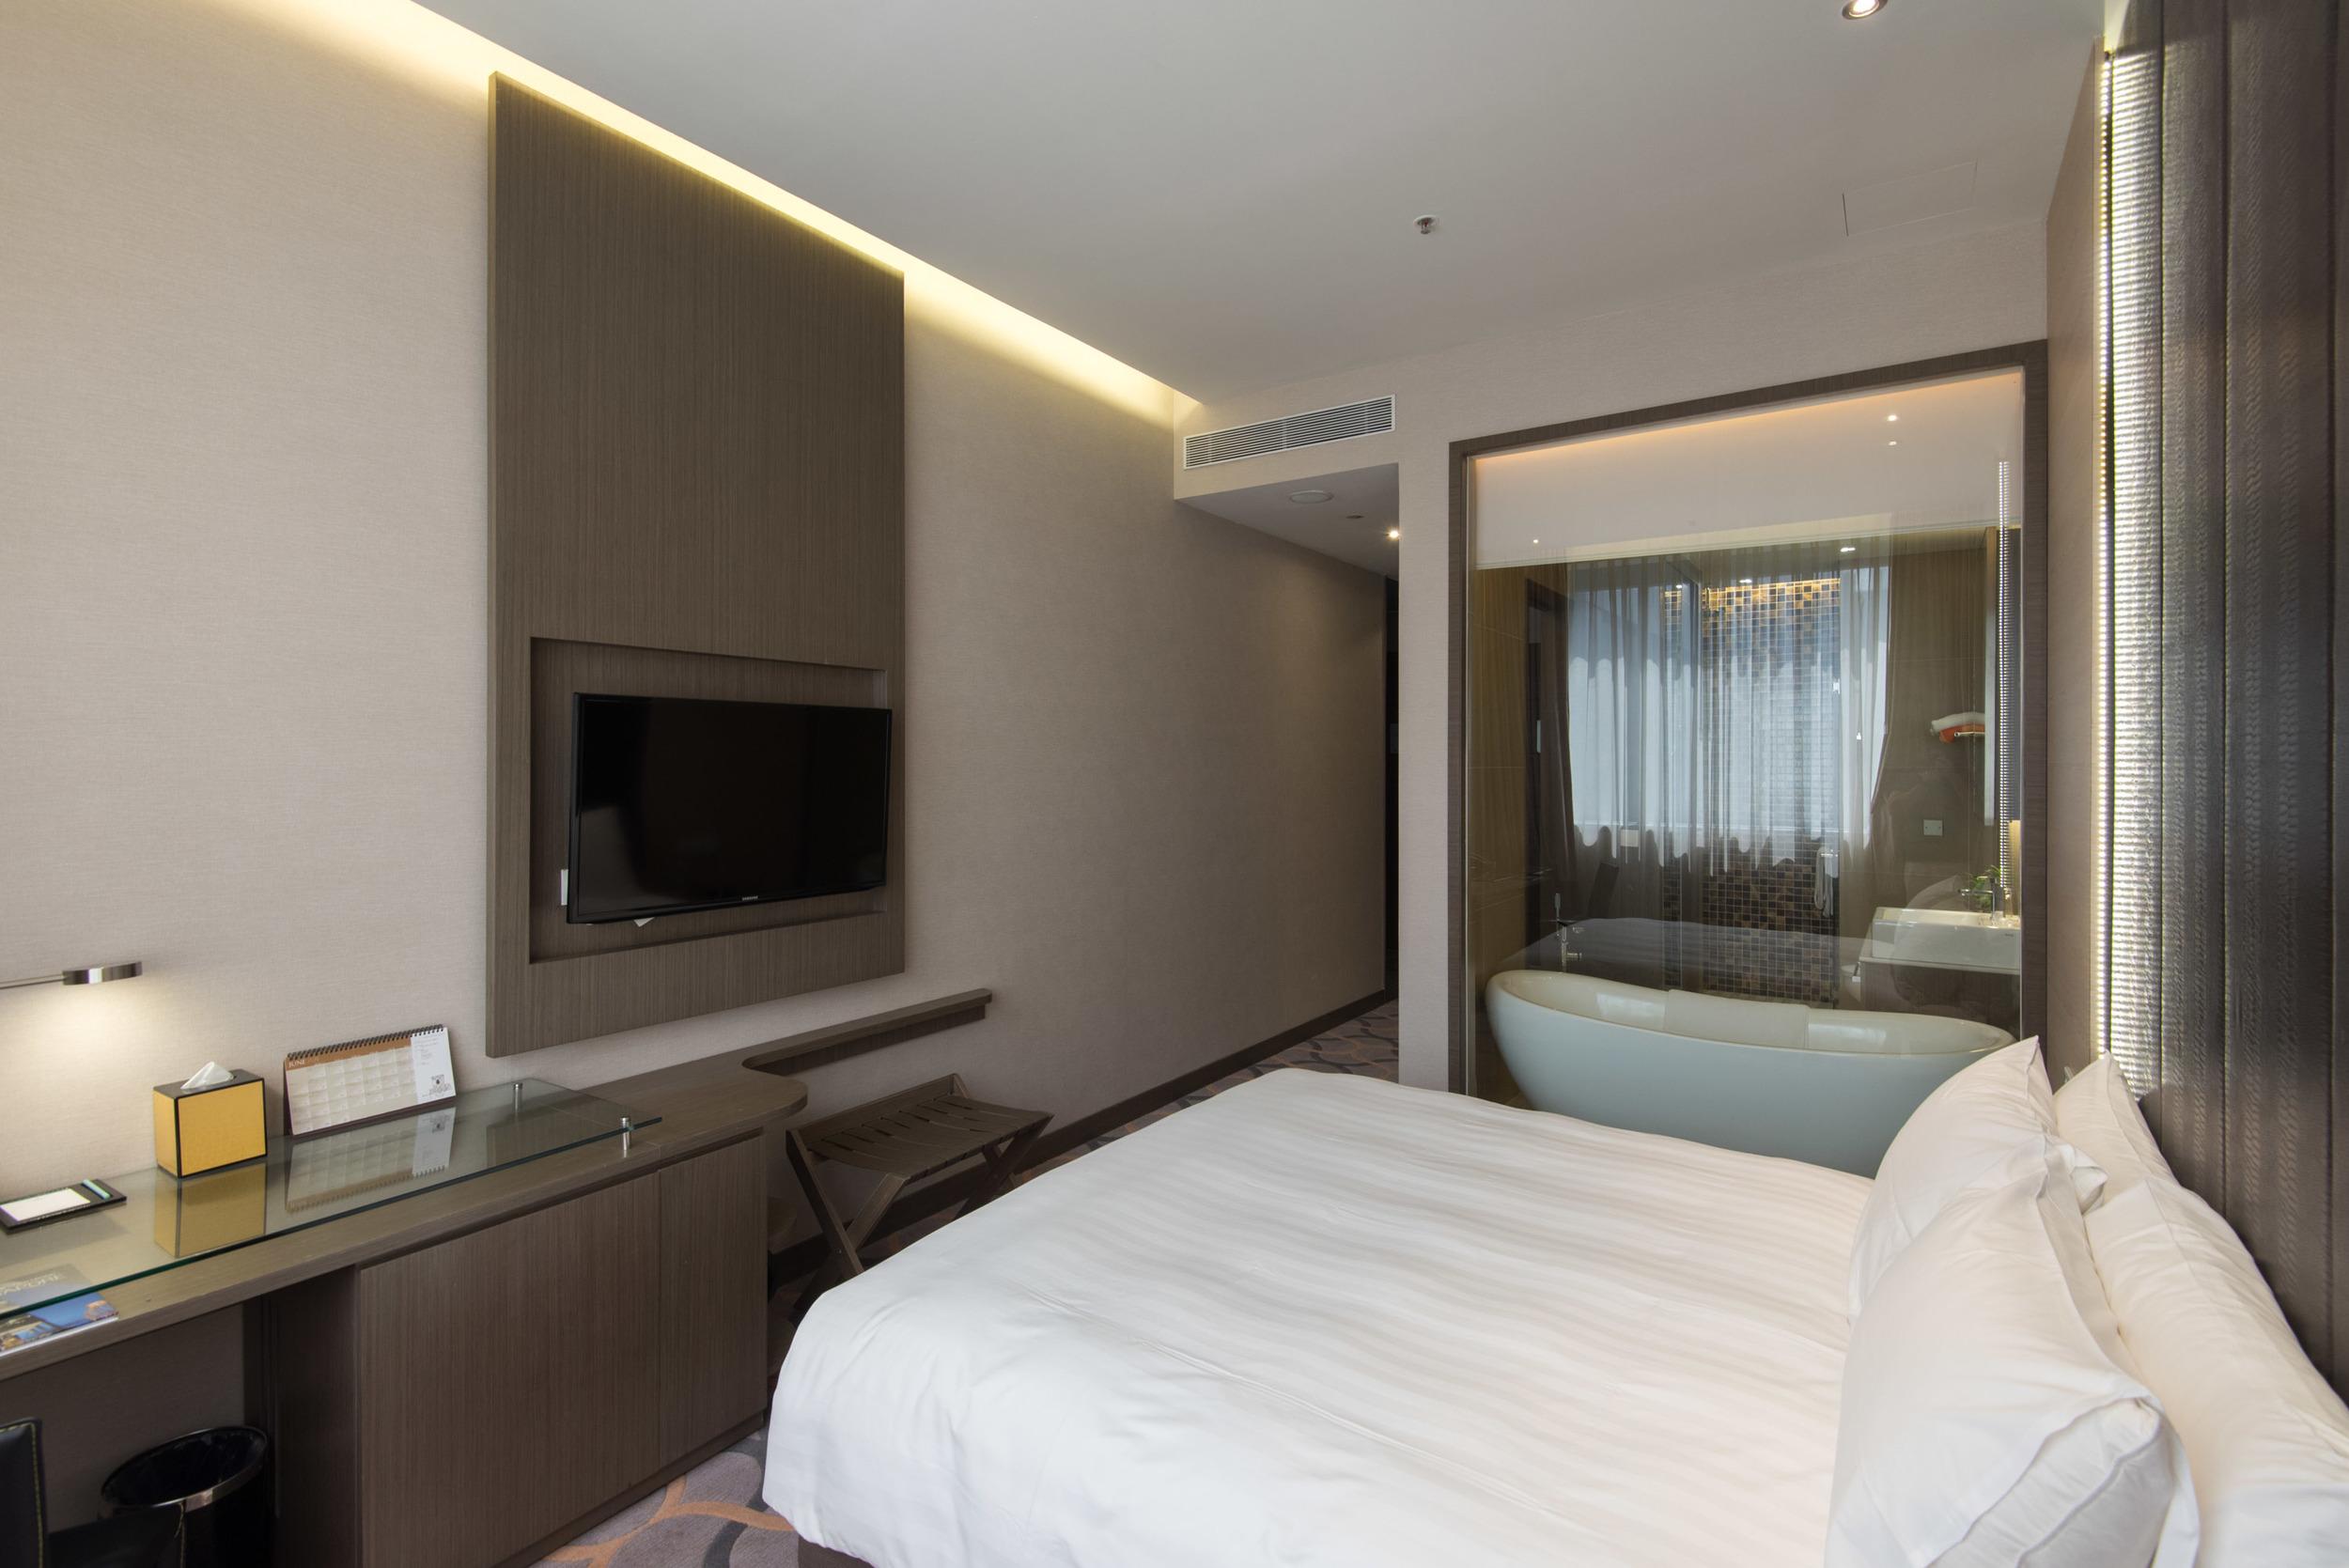 Splash Room at the Dorsett Singapore